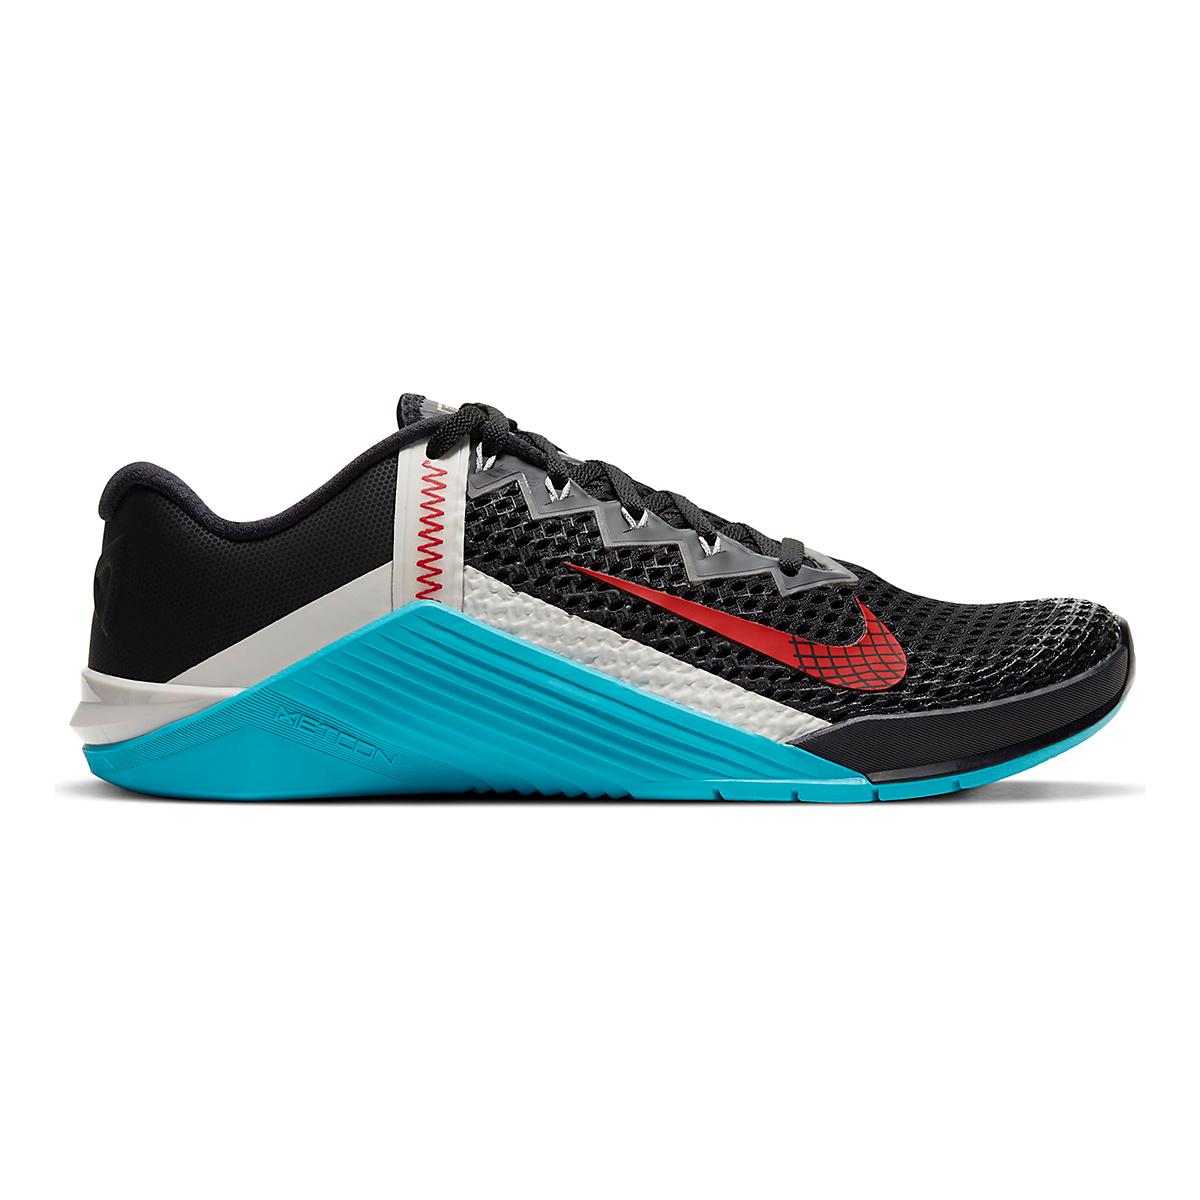 Men's Nike Metcon 6 Training Shoes - Color: Black/University Red/Light Blue Fury - Size: 5 - Width: Regular, Black/University Red/Light Blue Fury, large, image 1